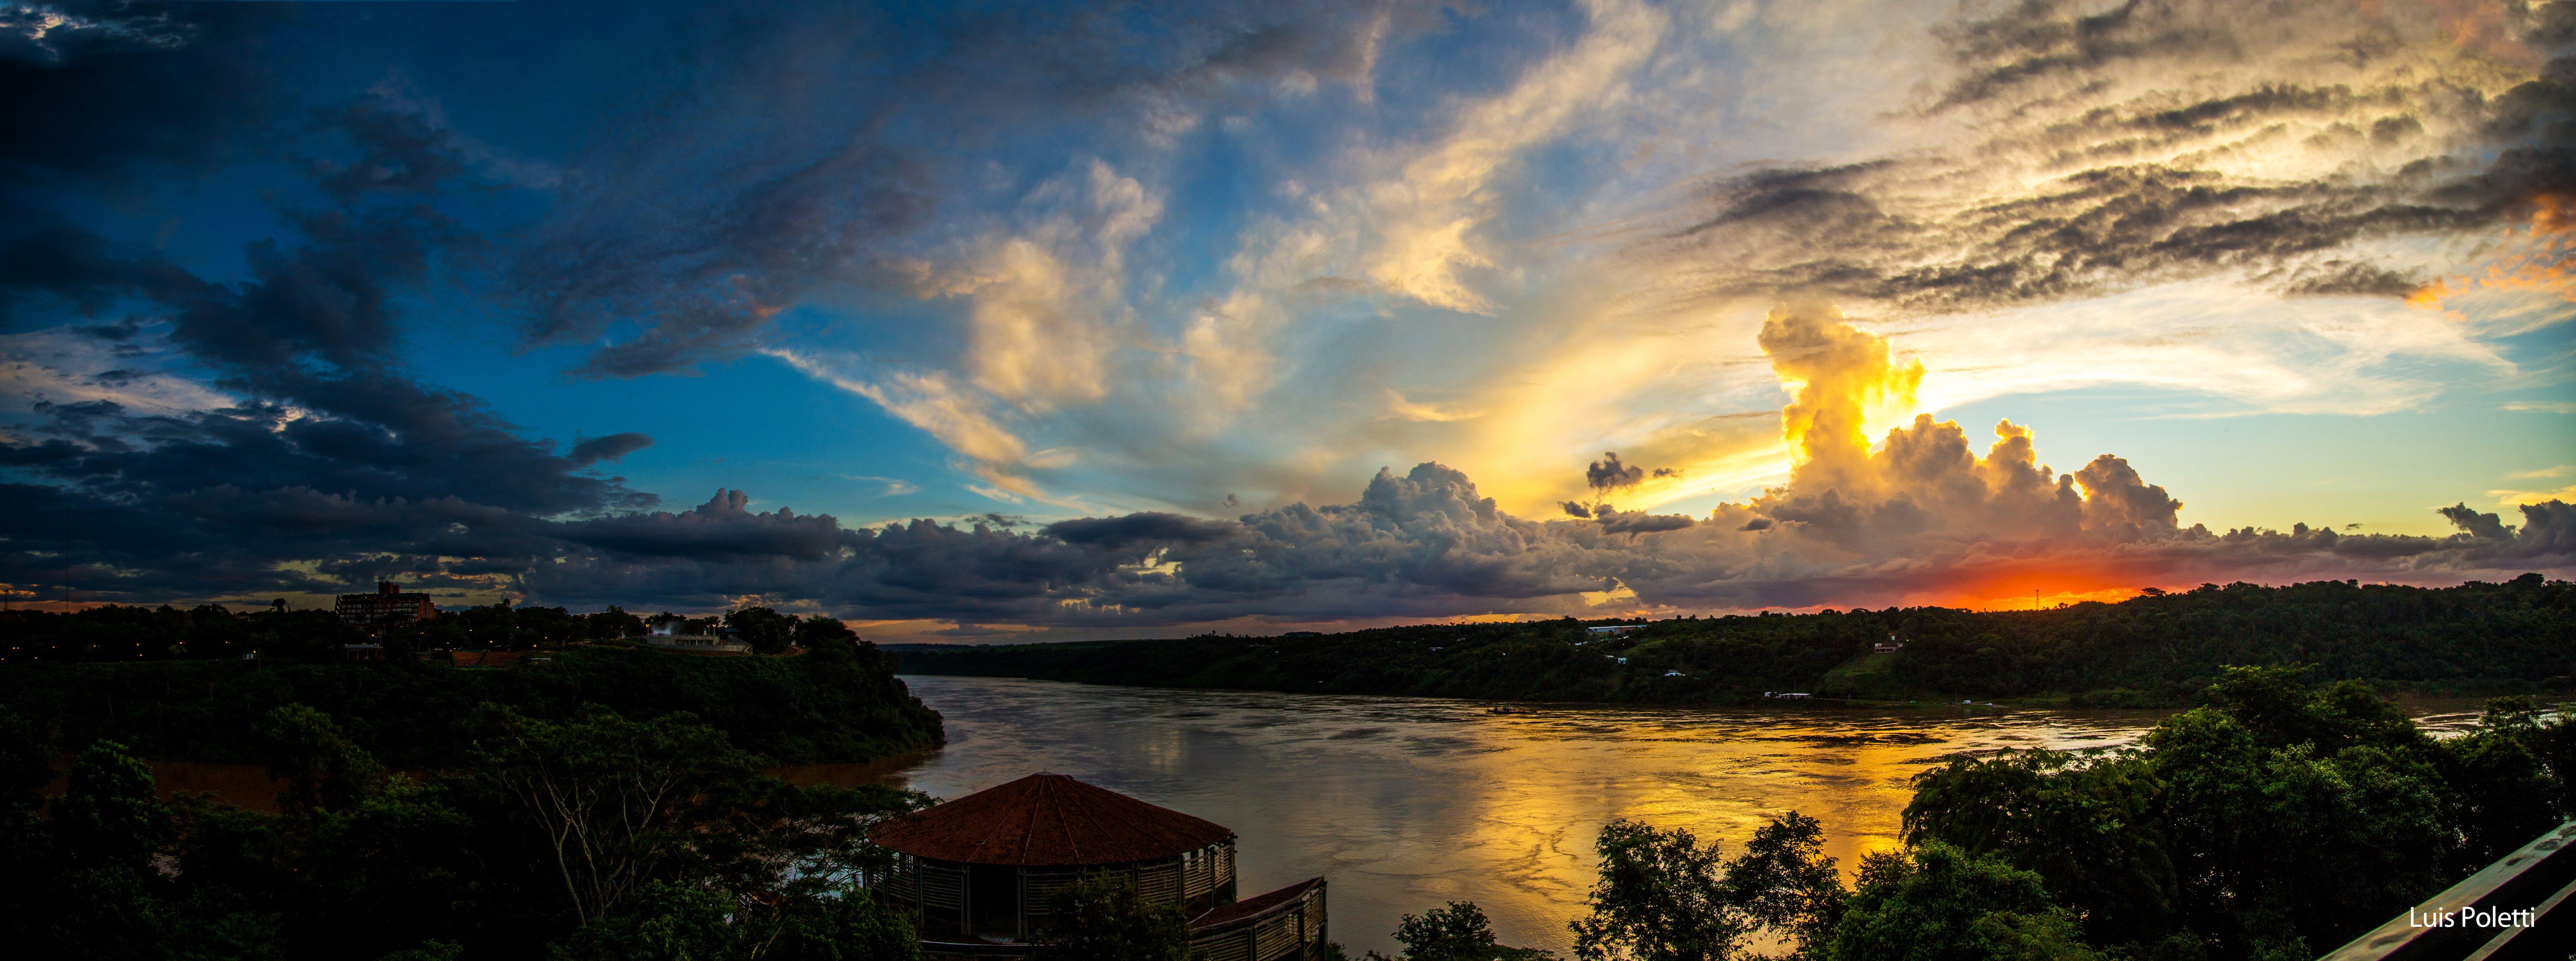 Free stock photo of landscape, nature, sky, sunset